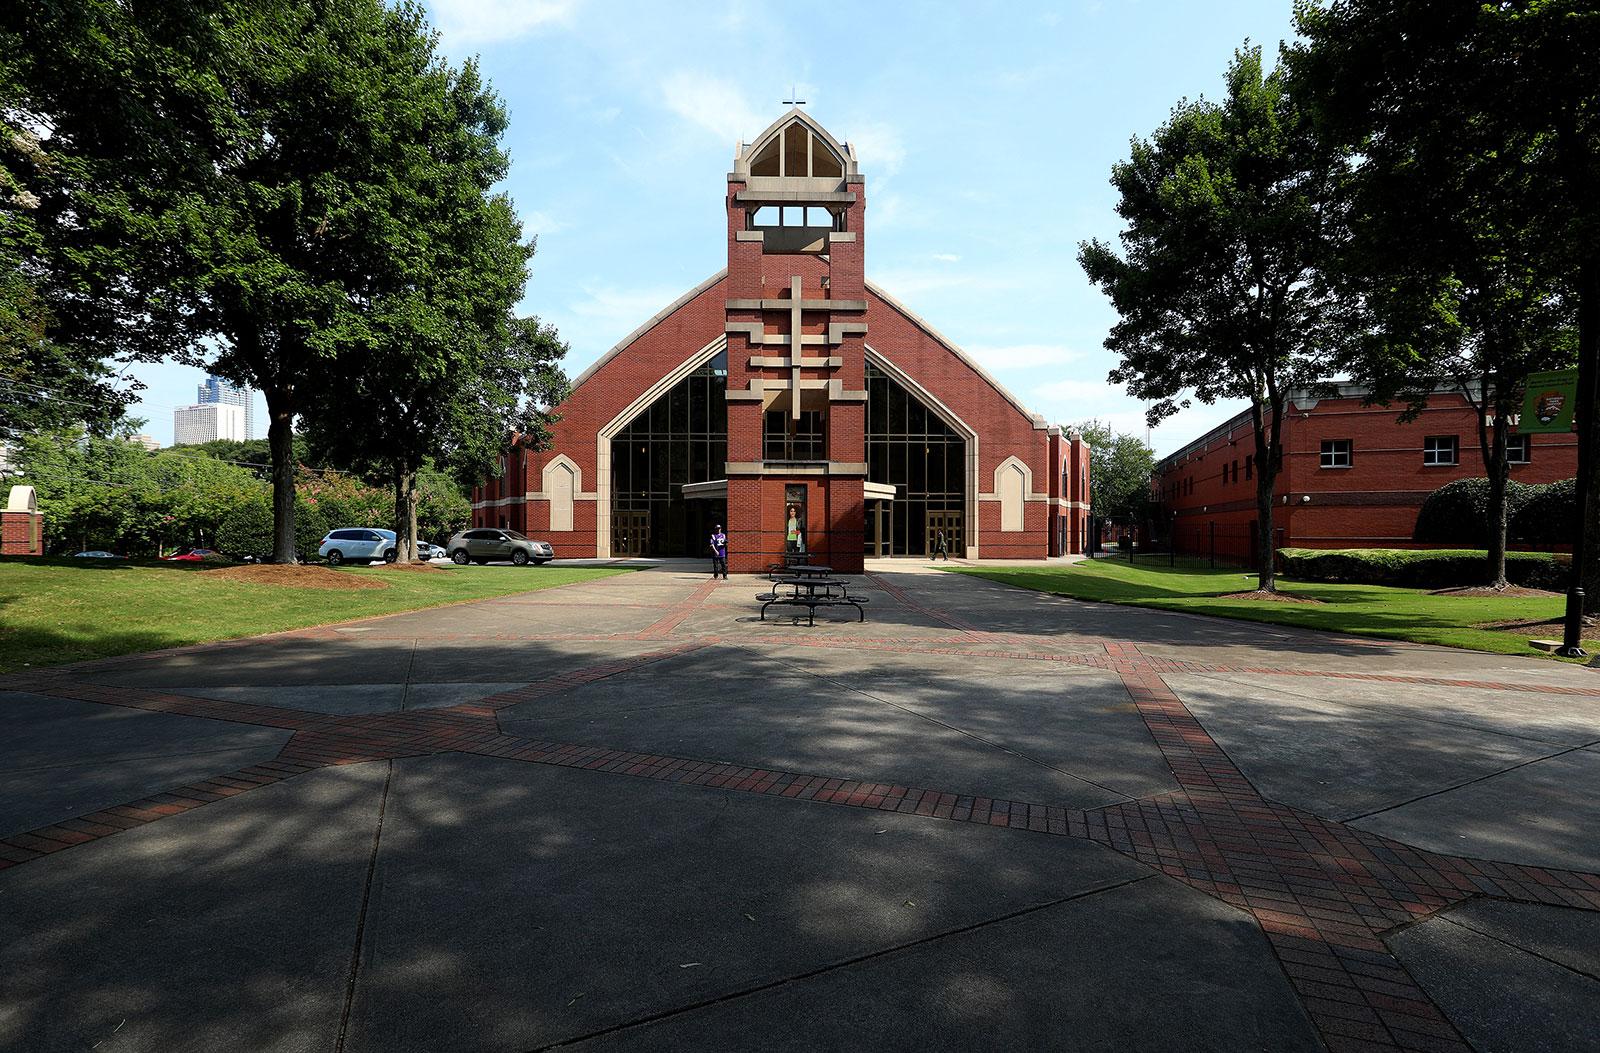 The exterior of Ebenezer Baptist Church in Atlanta, Georgia.